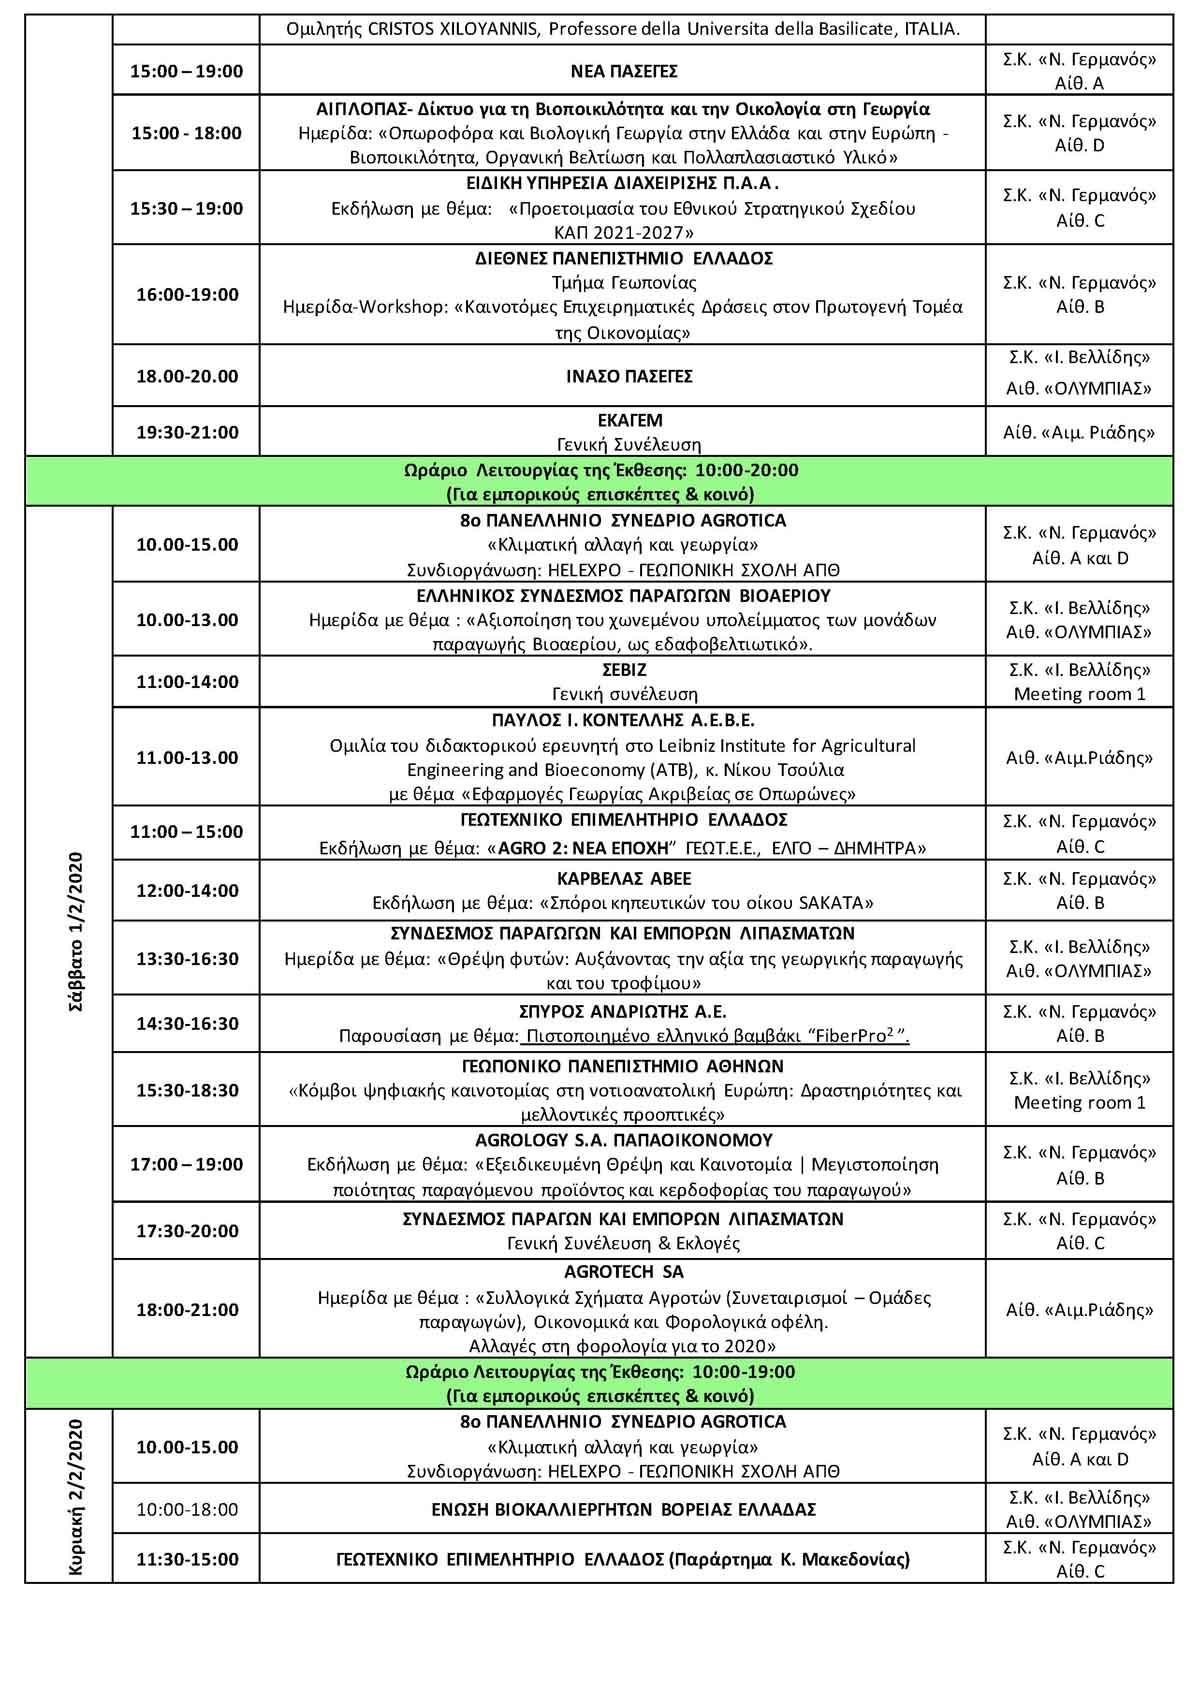 programma-agrotica-2020-αγροτικα-προγραμμα